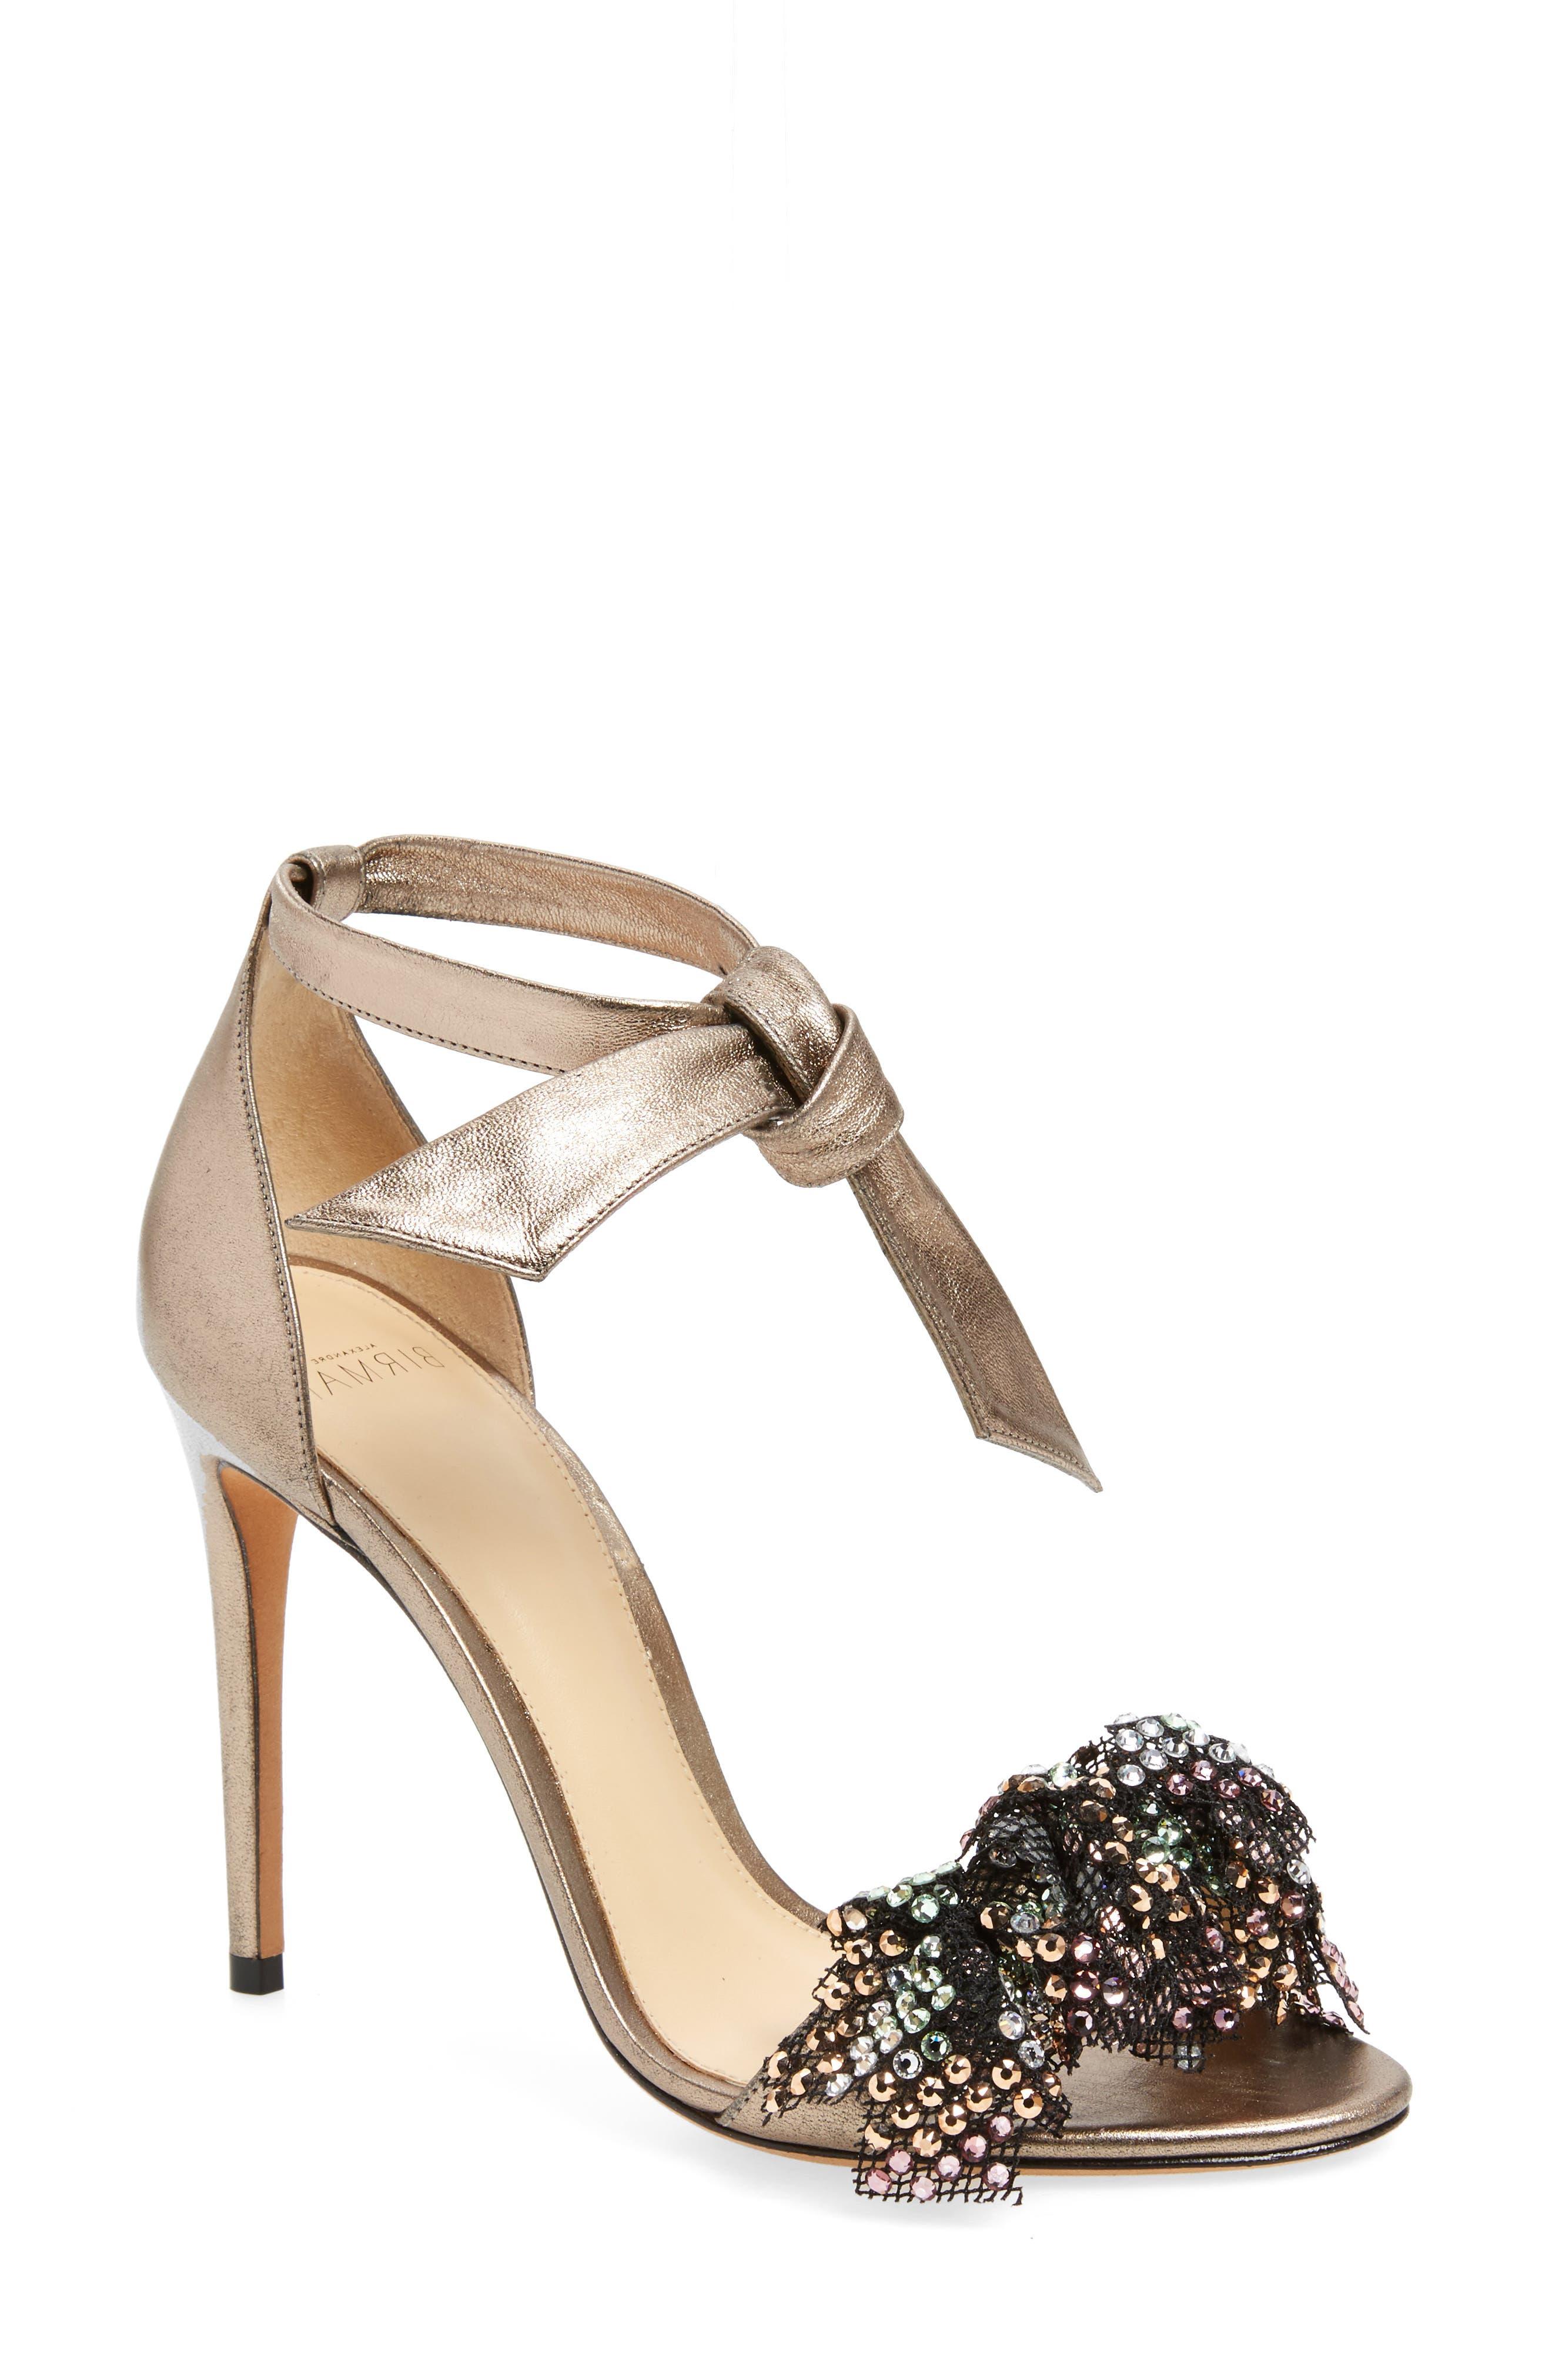 Main Image - Alexandre Birman Clarita Show Embellished Ankle Tie Sandal